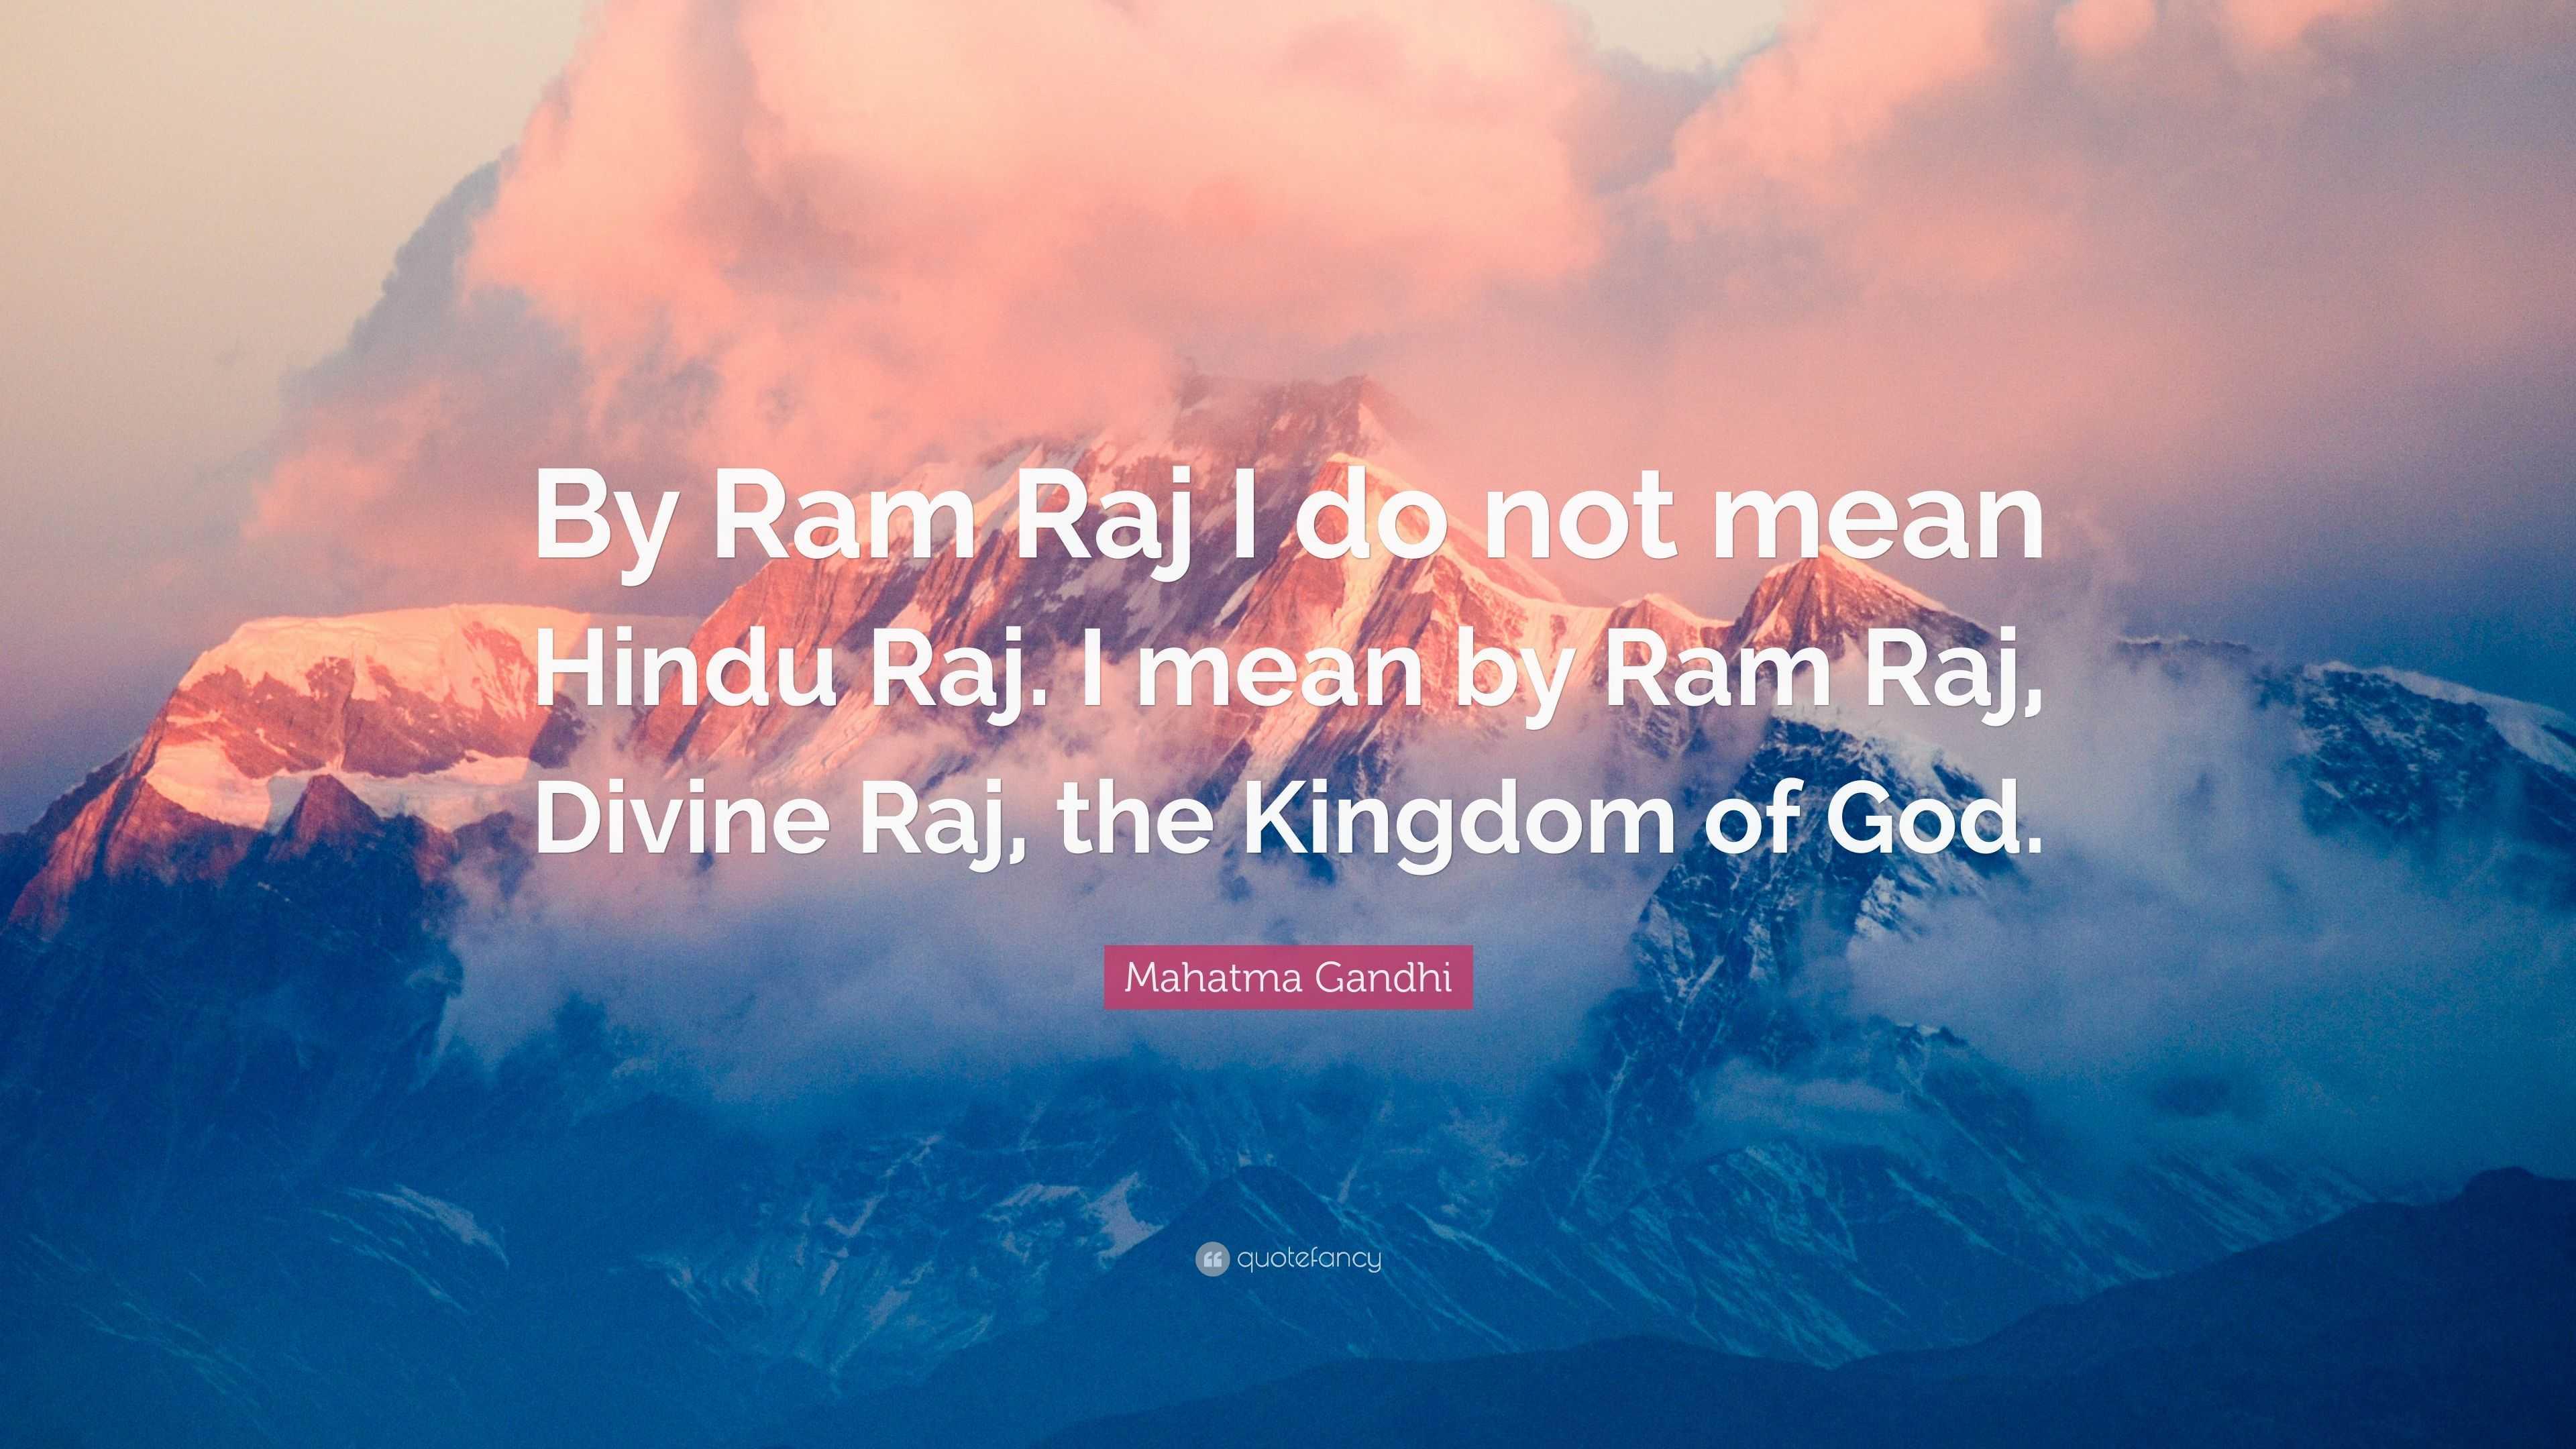 Mahatma Gandhi Quote By Ram Raj I Do Not Mean Hindu Raj I Mean By